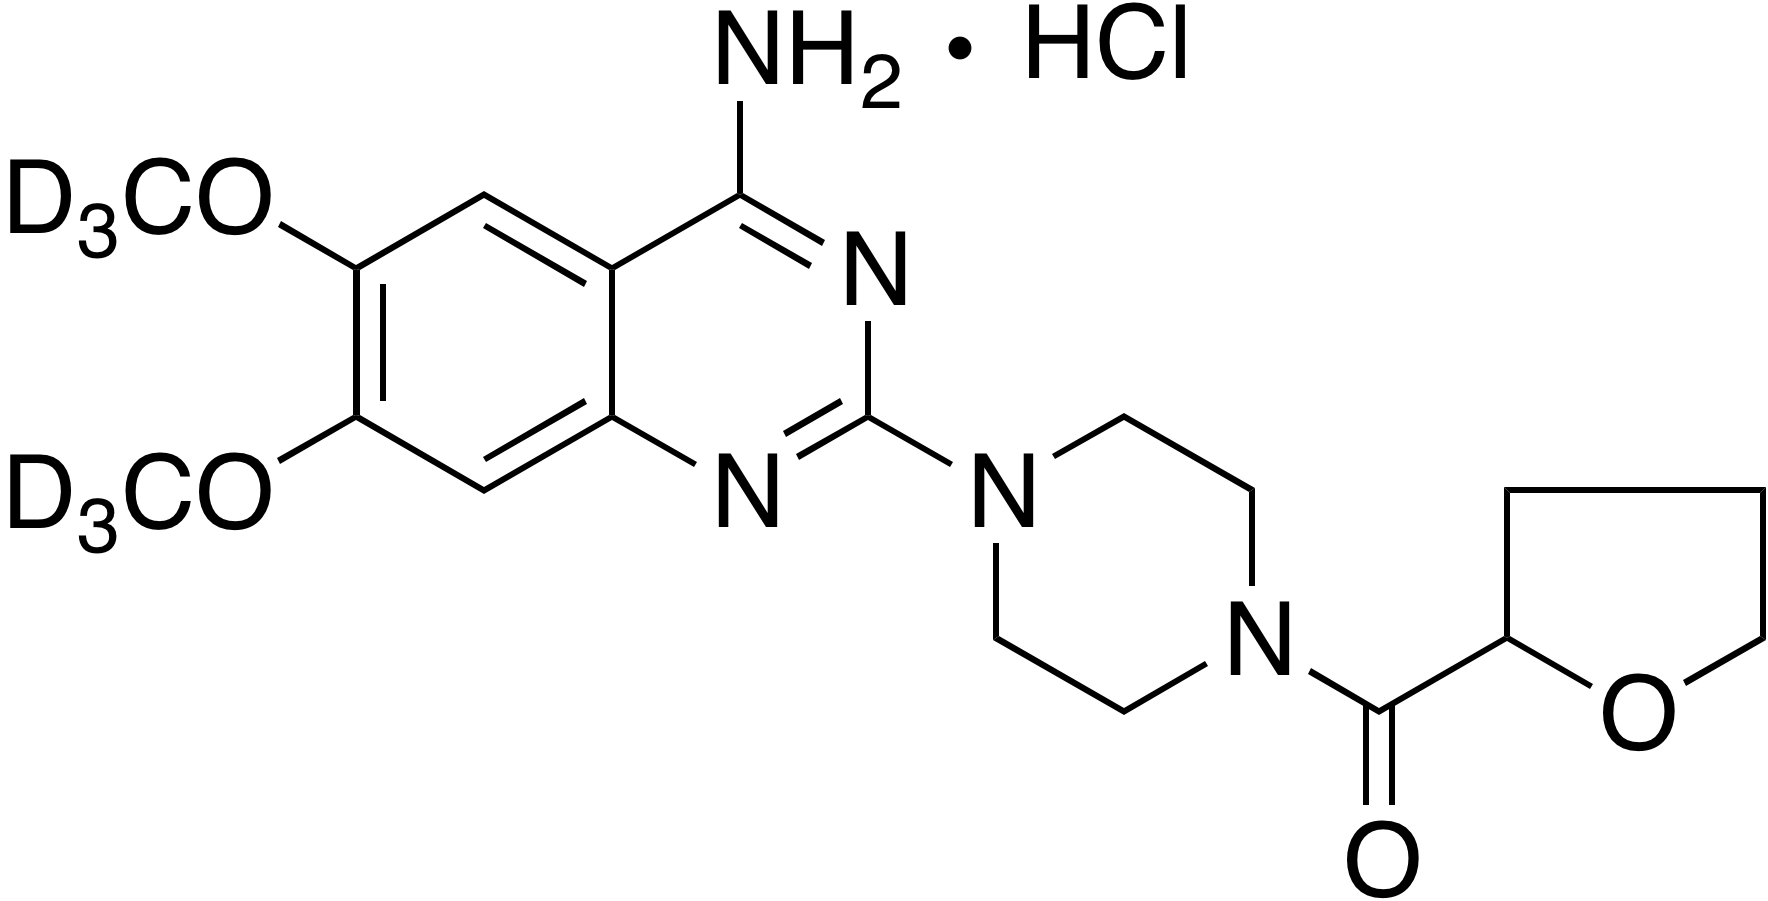 Terazosin-d<sub>6</sub> hydrochloride